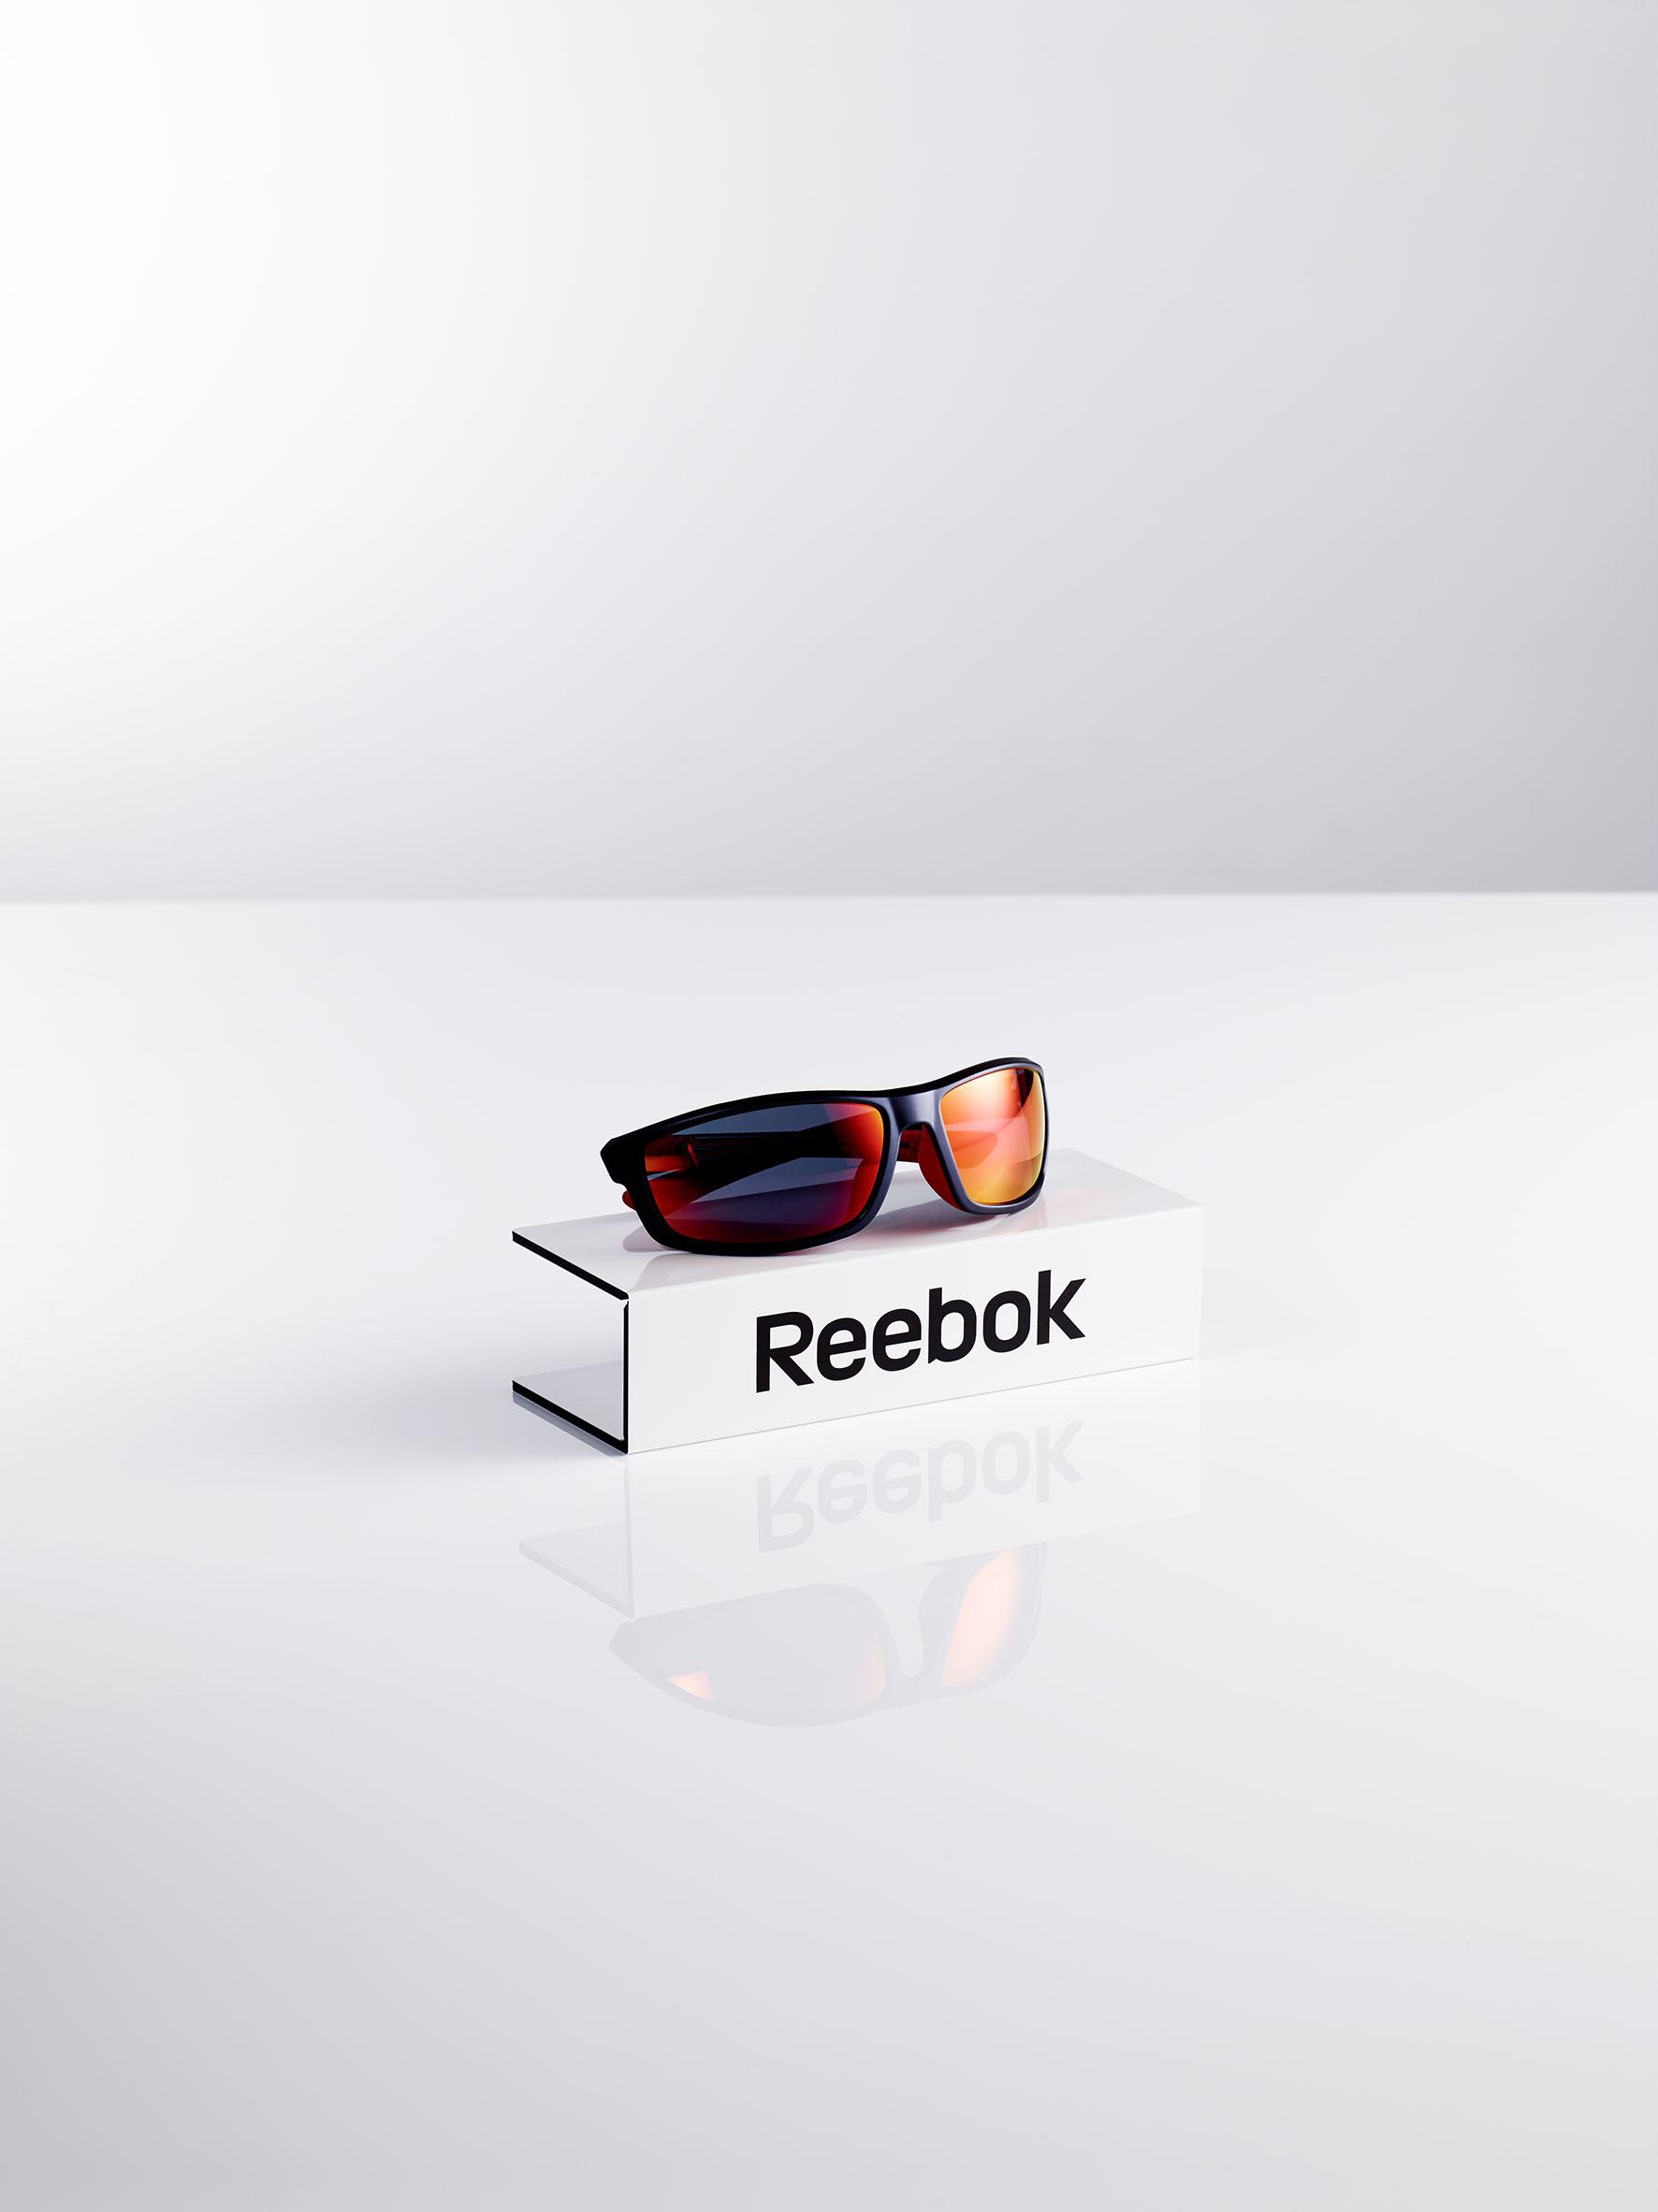 Reebok display